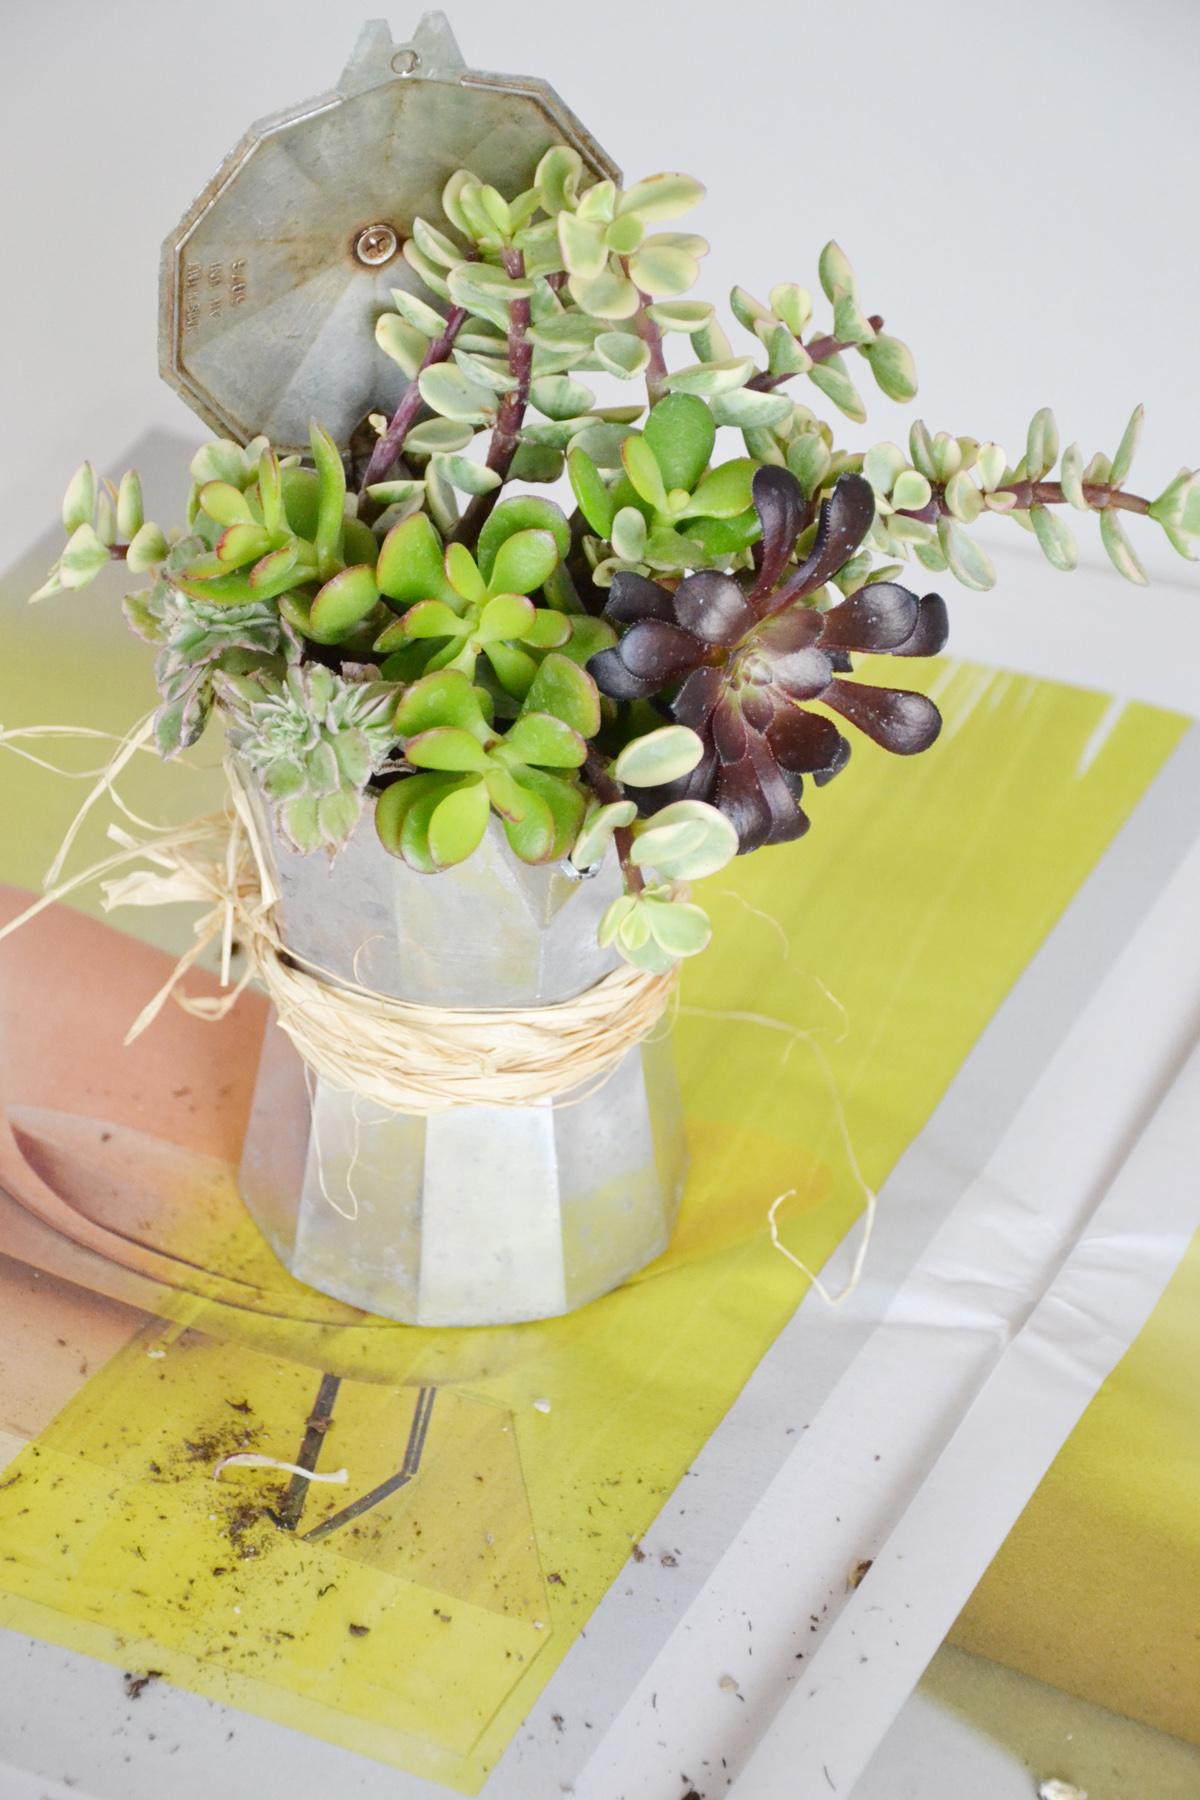 Vasi sospesi per piante fai da te vasi per piante for Vasi sospesi